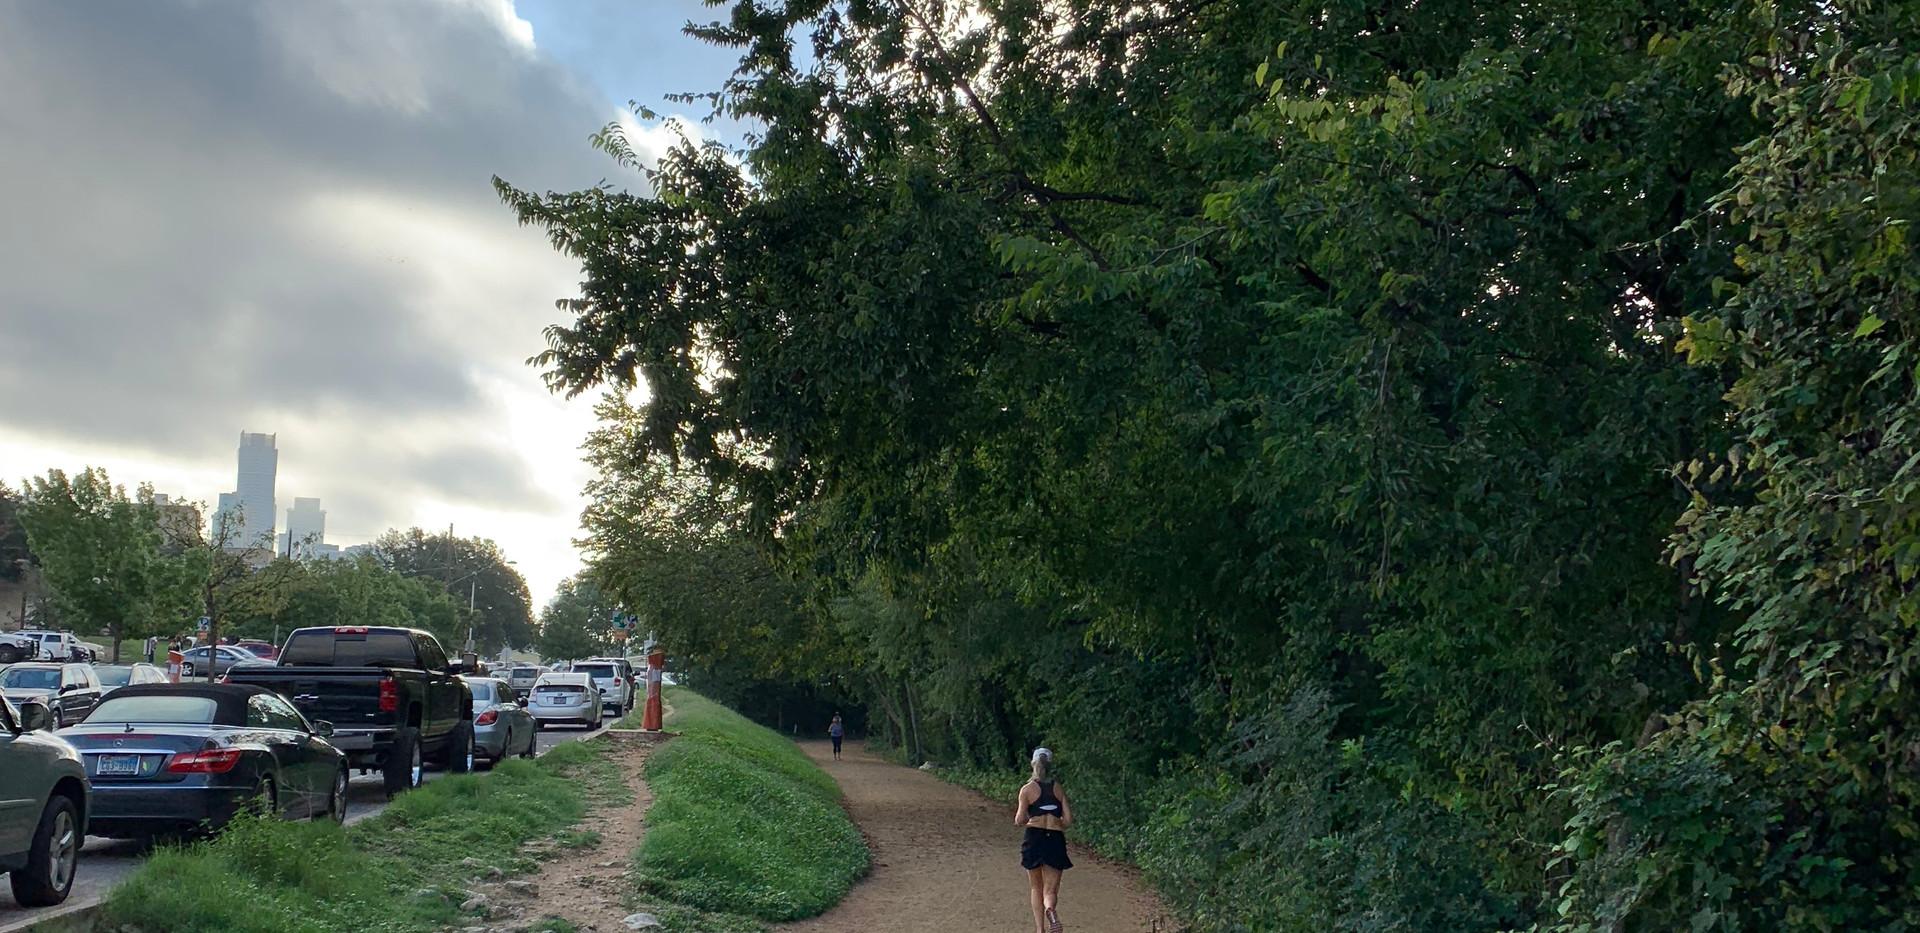 Townlake: Manicured trail in townlake